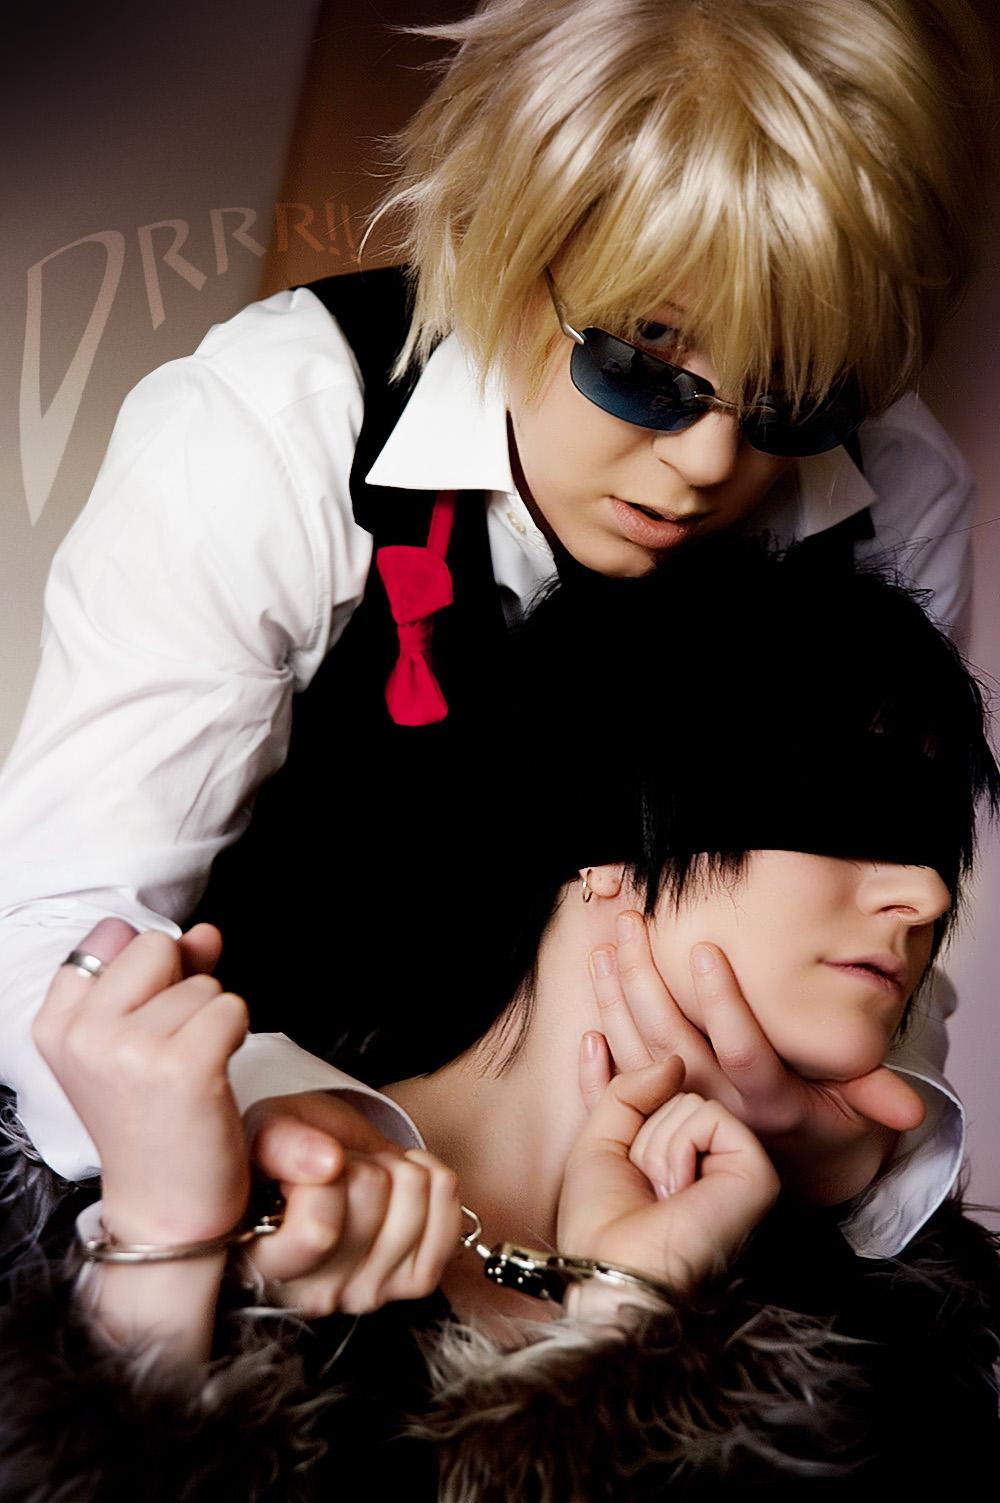 http://fc03.deviantart.net/fs71/f/2010/078/1/c/Durarara__Where_Izaya_belongs_by_Majin_sama.jpg